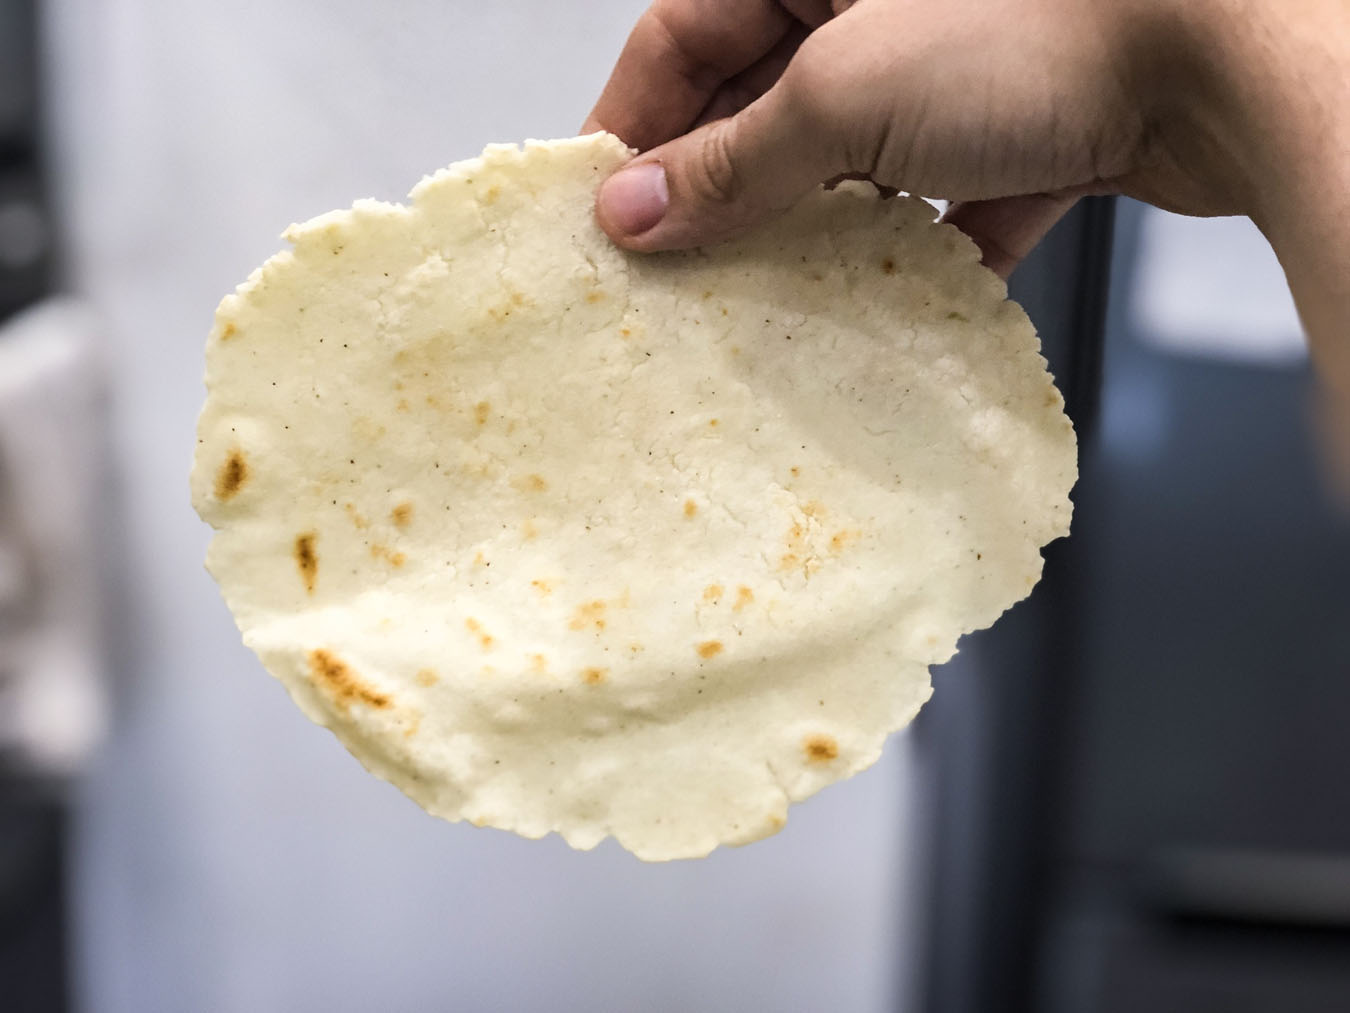 https://www.stonerchef.pl/wp-content/uploads/2019/05/kukurydziana-tortilla.jpg